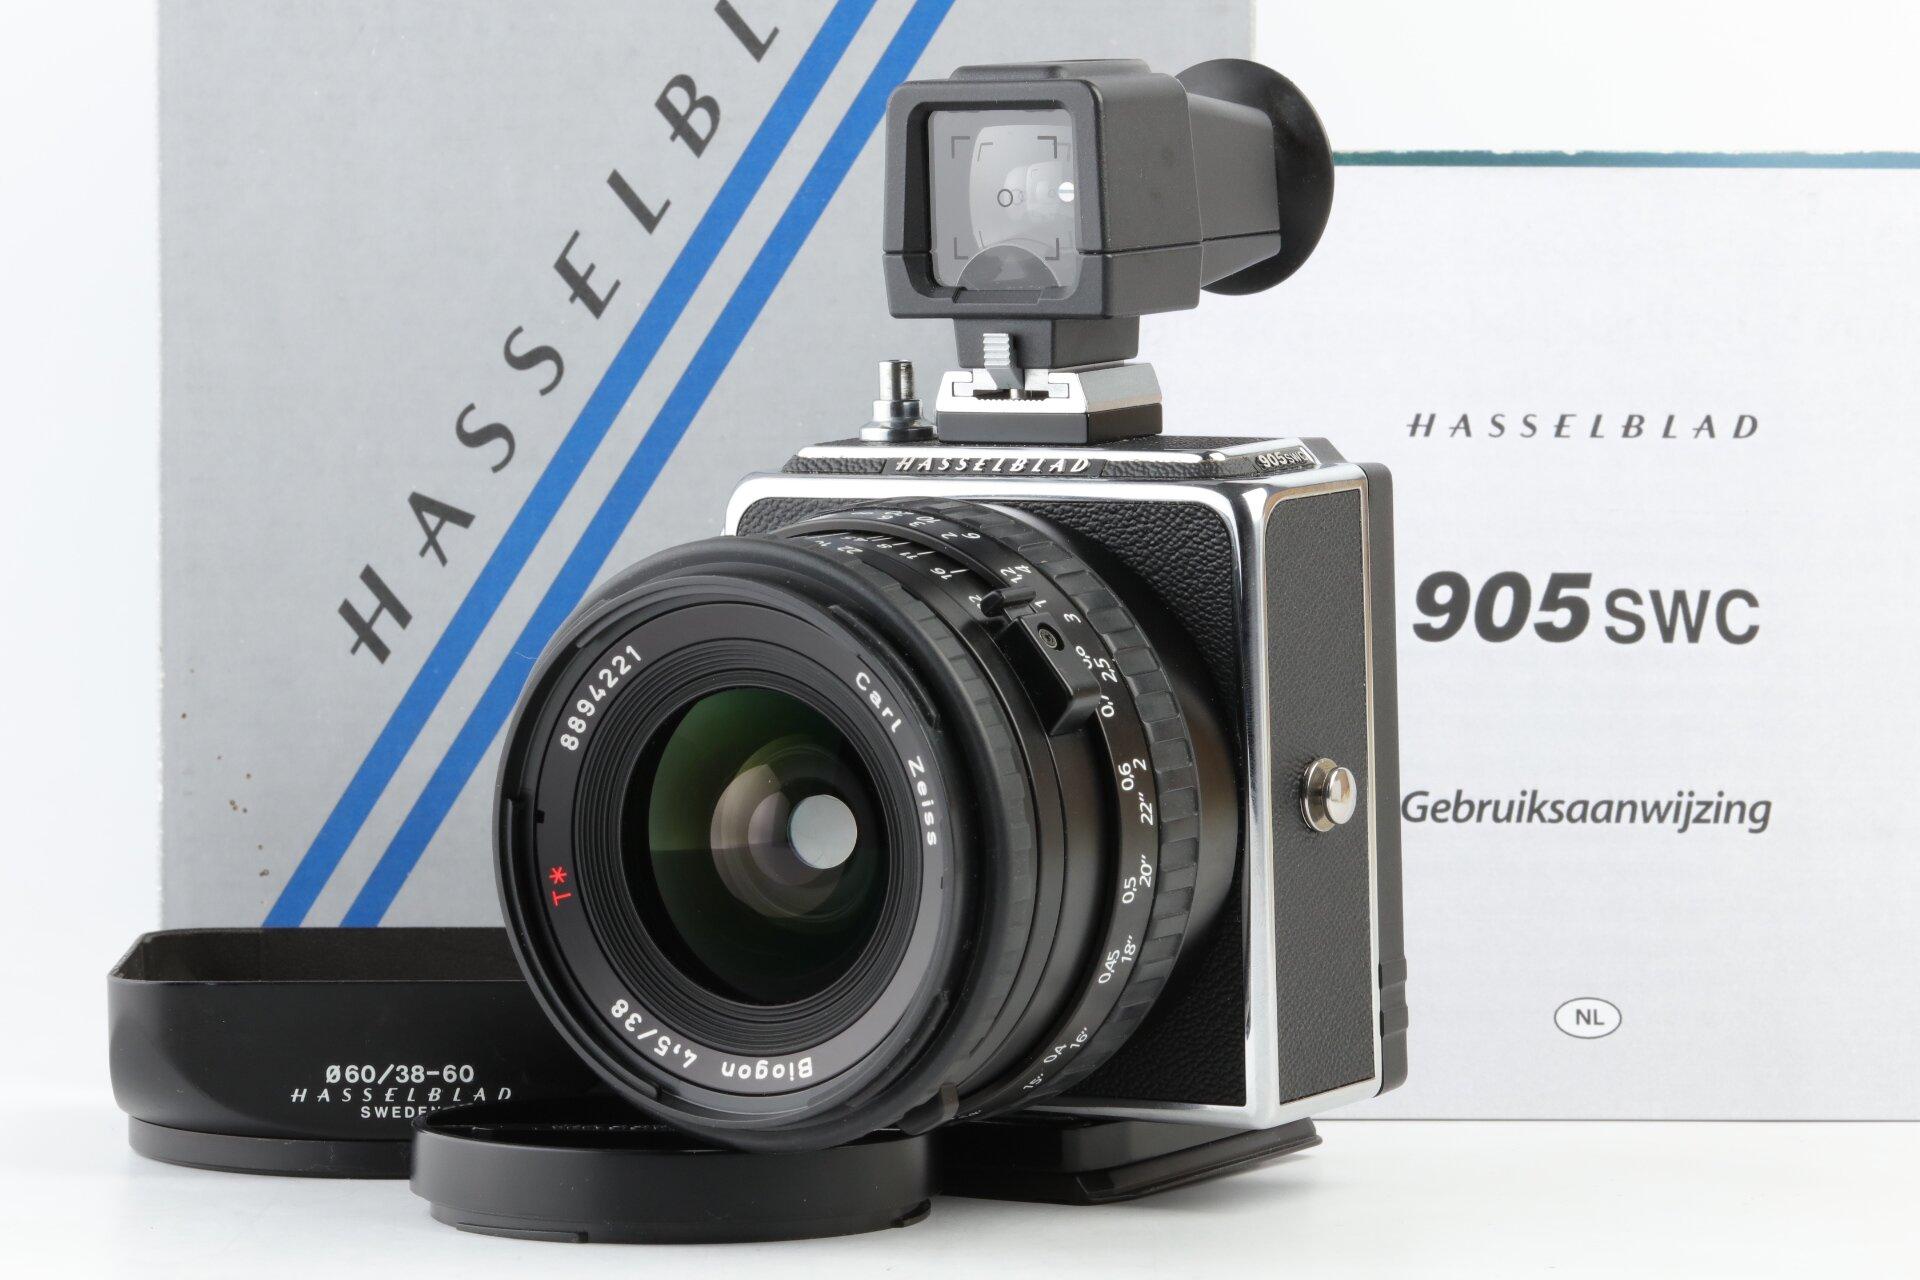 Hasselblad 905 SWC Carl Zeiss Biogon 4,5/38mm CFi T*